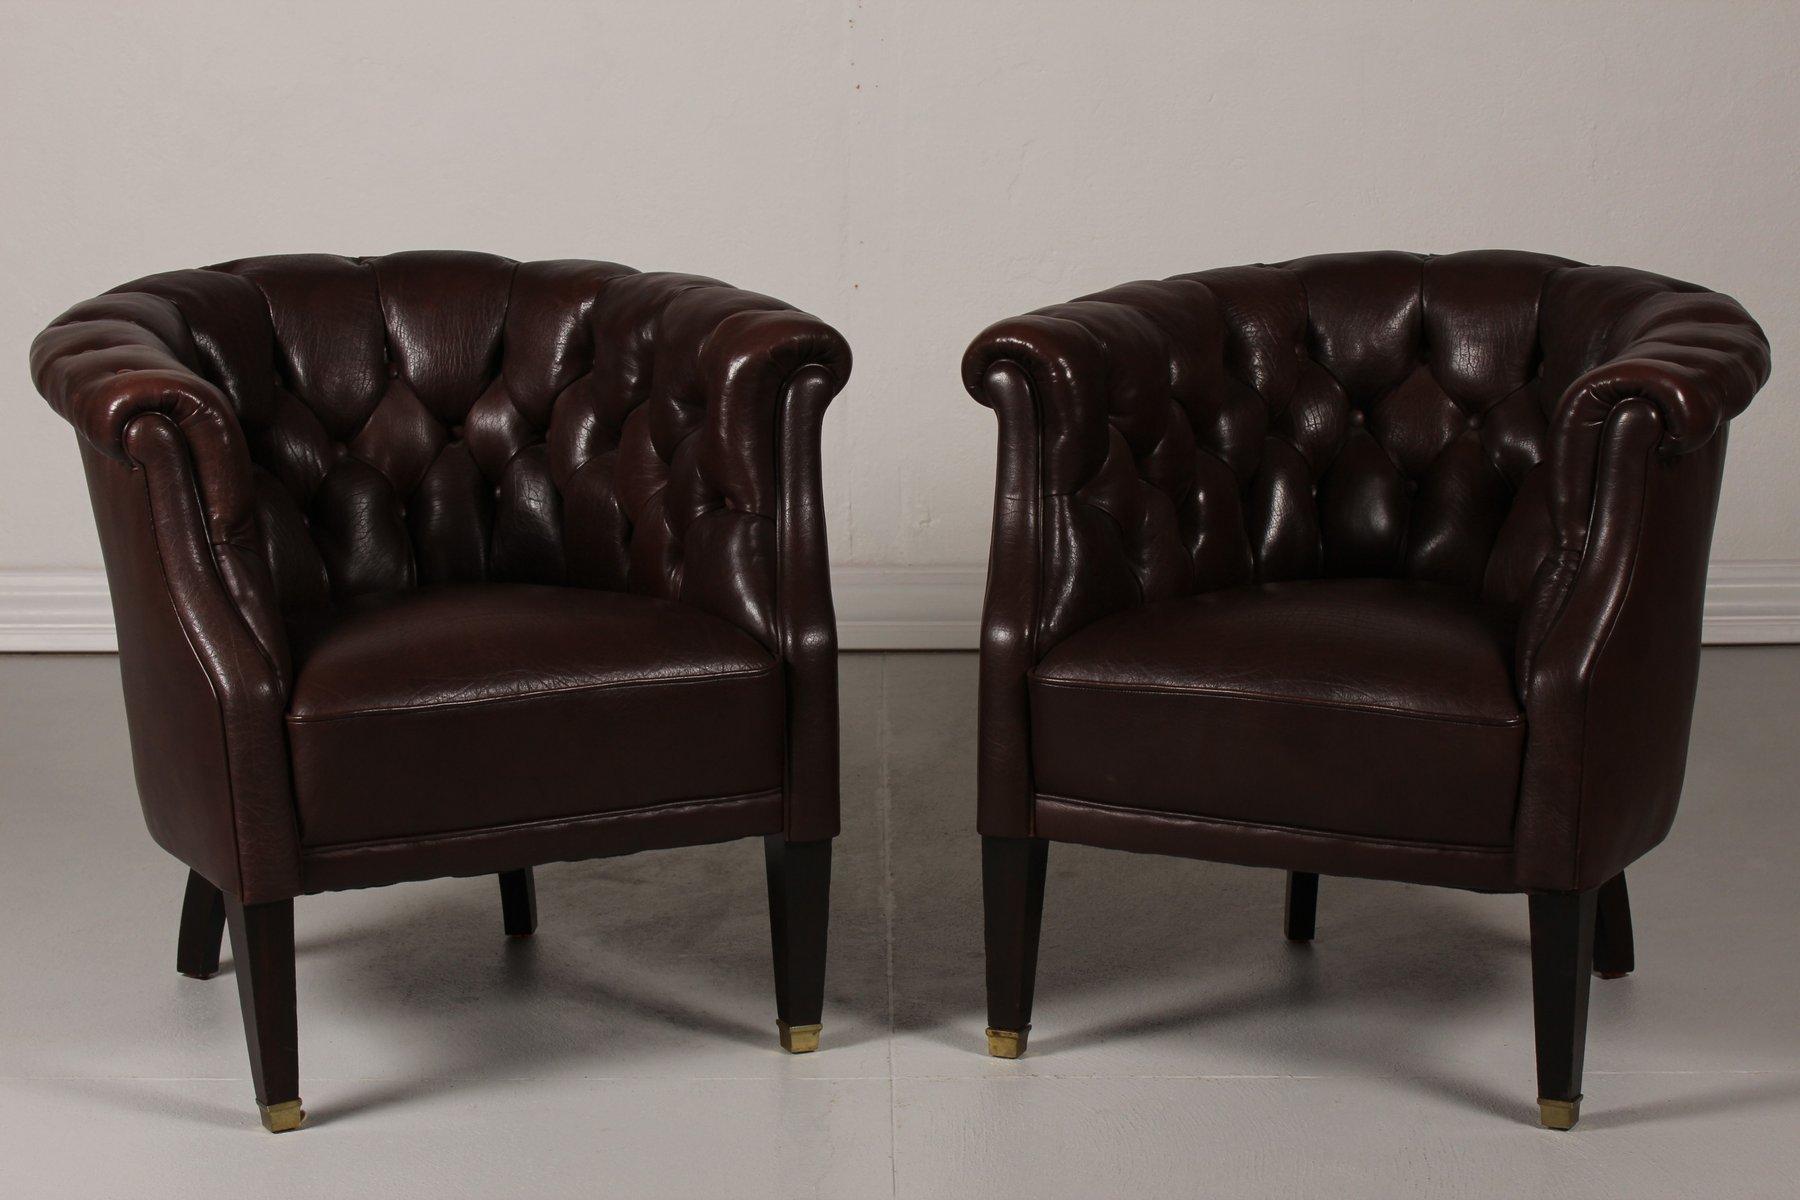 Dänische Sessel aus dunkelbraunem Leder im Chesterfield Stil, 1920er, ...